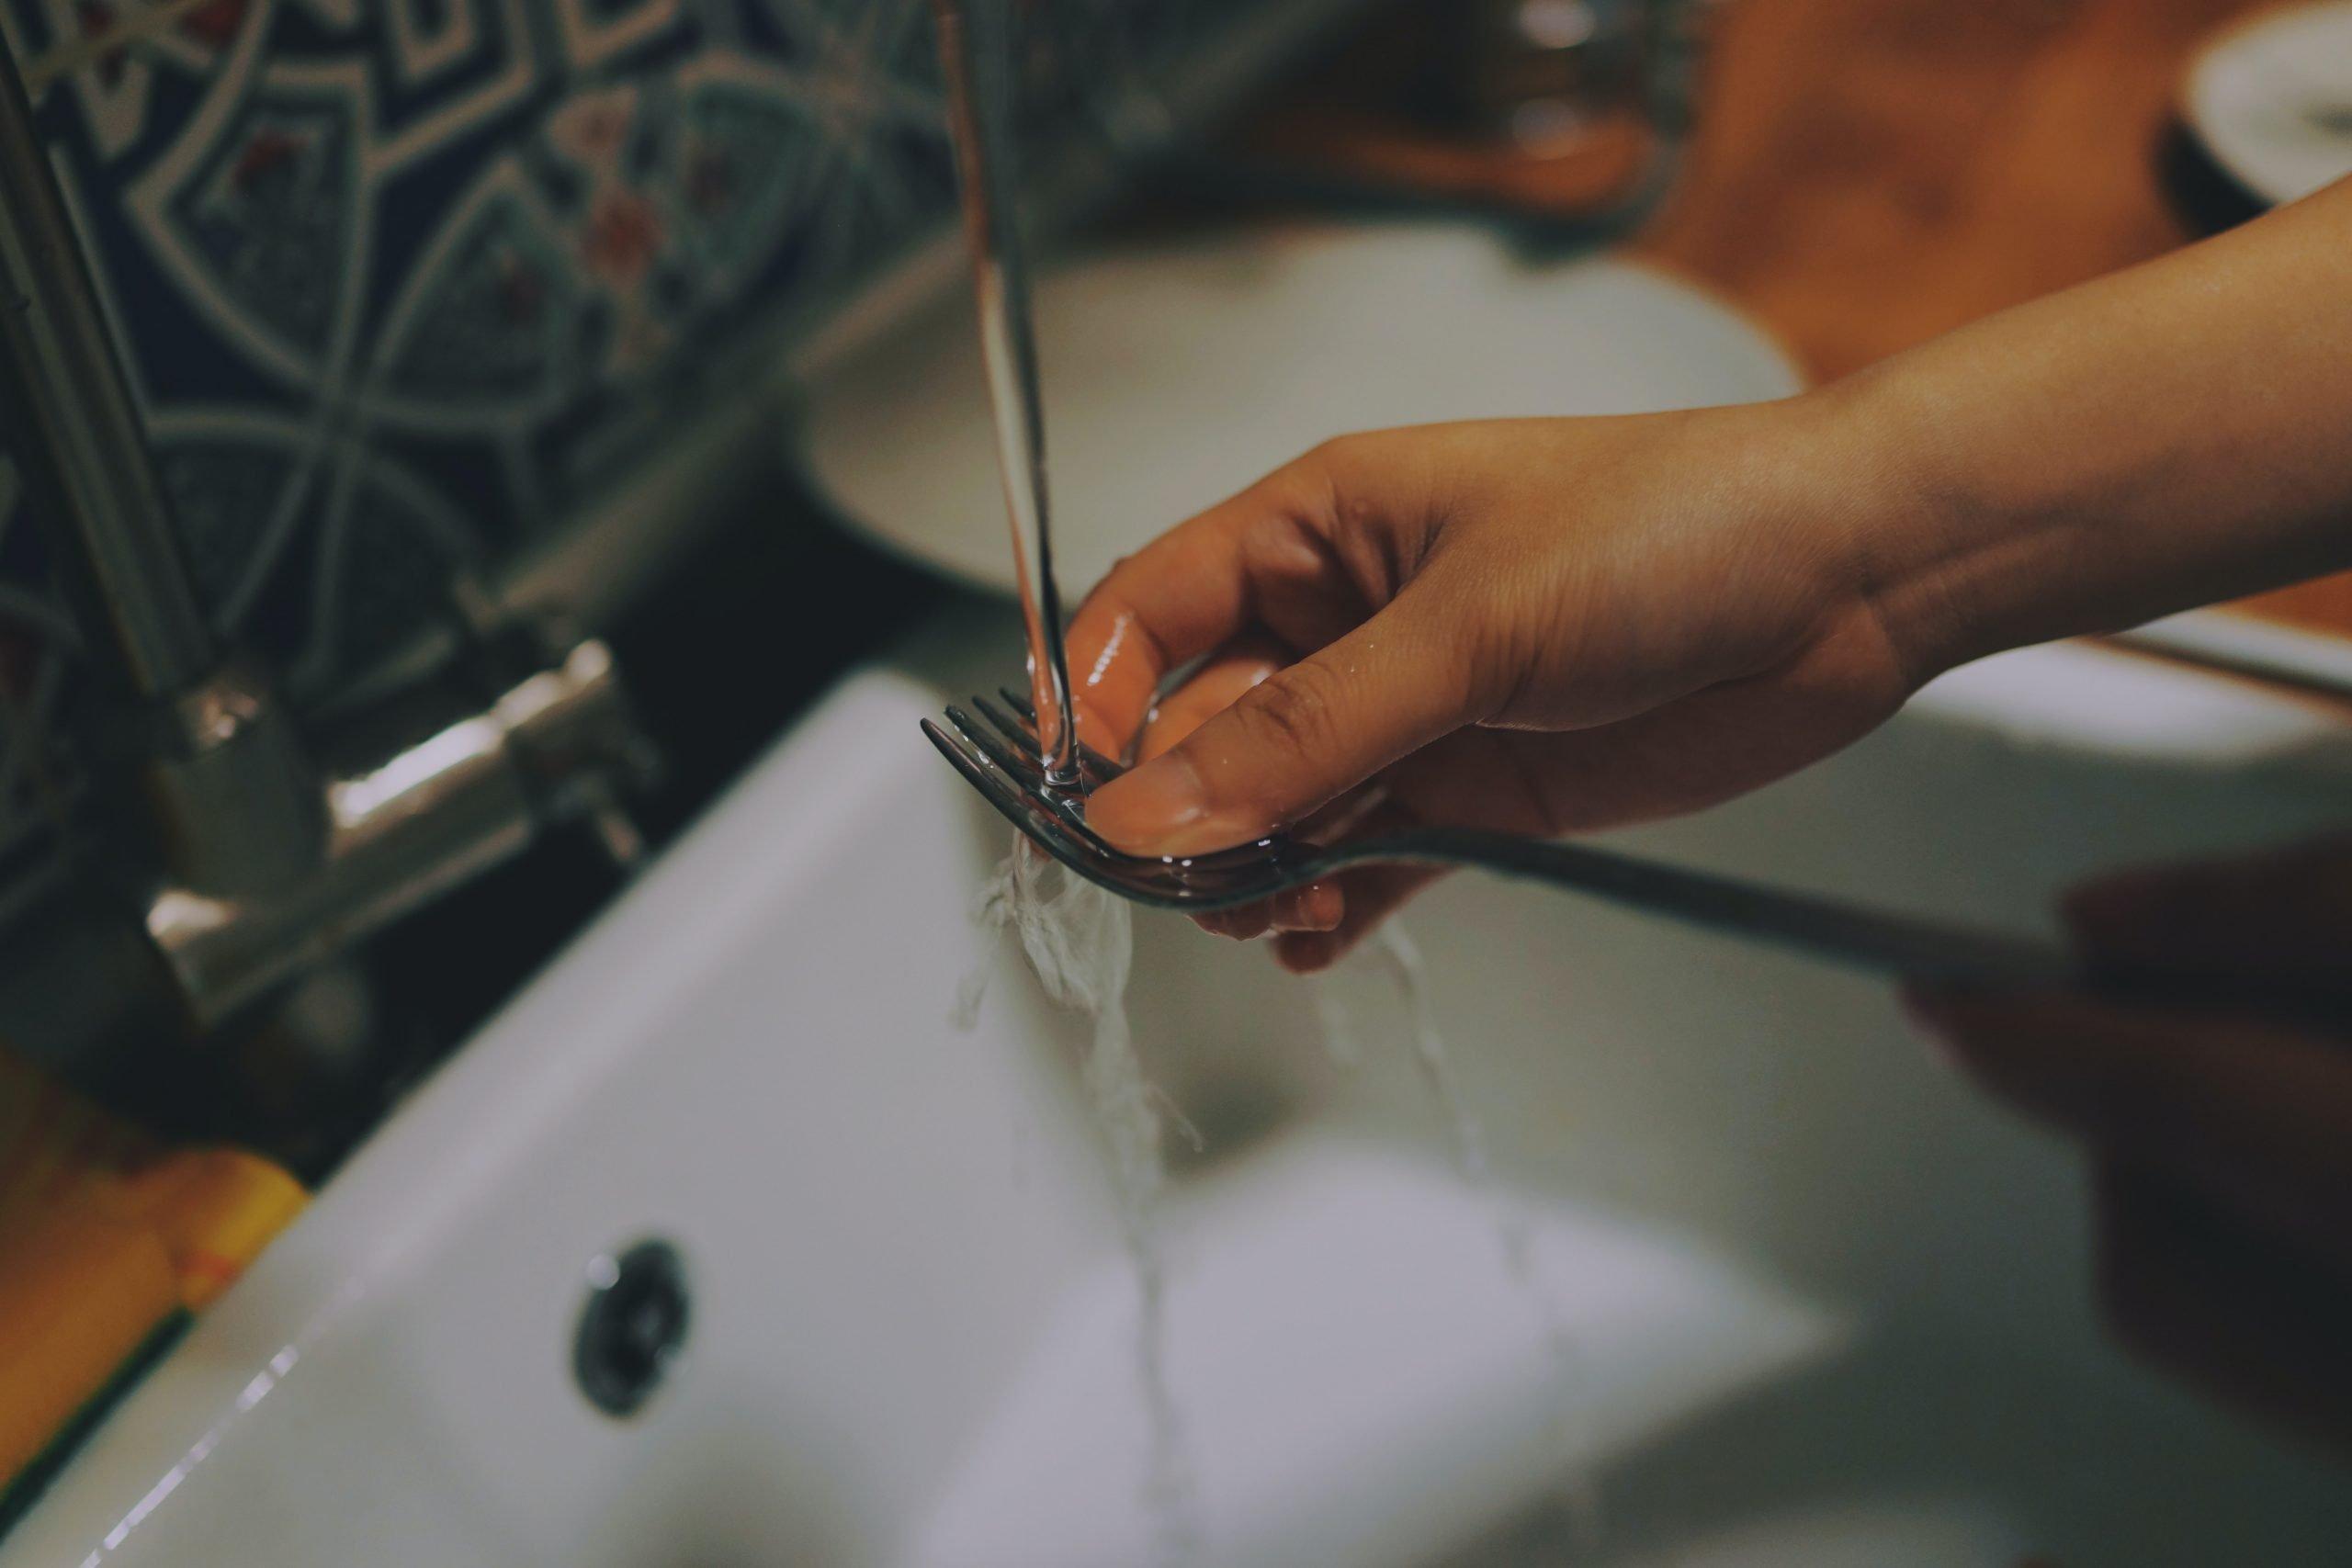 mano fregando un tenedor sobre fregadore